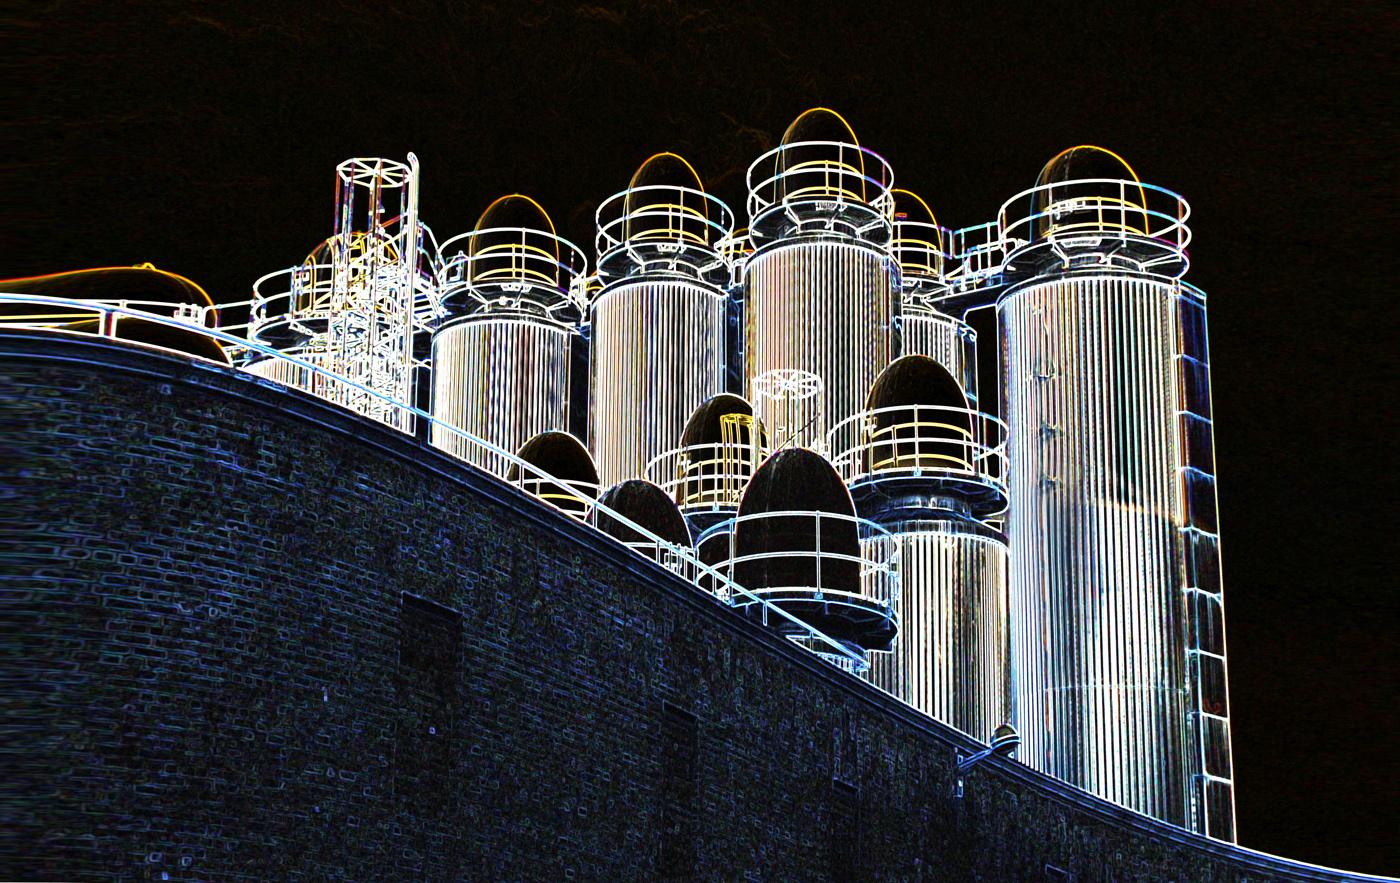 roberta houston - Guinness Brewery